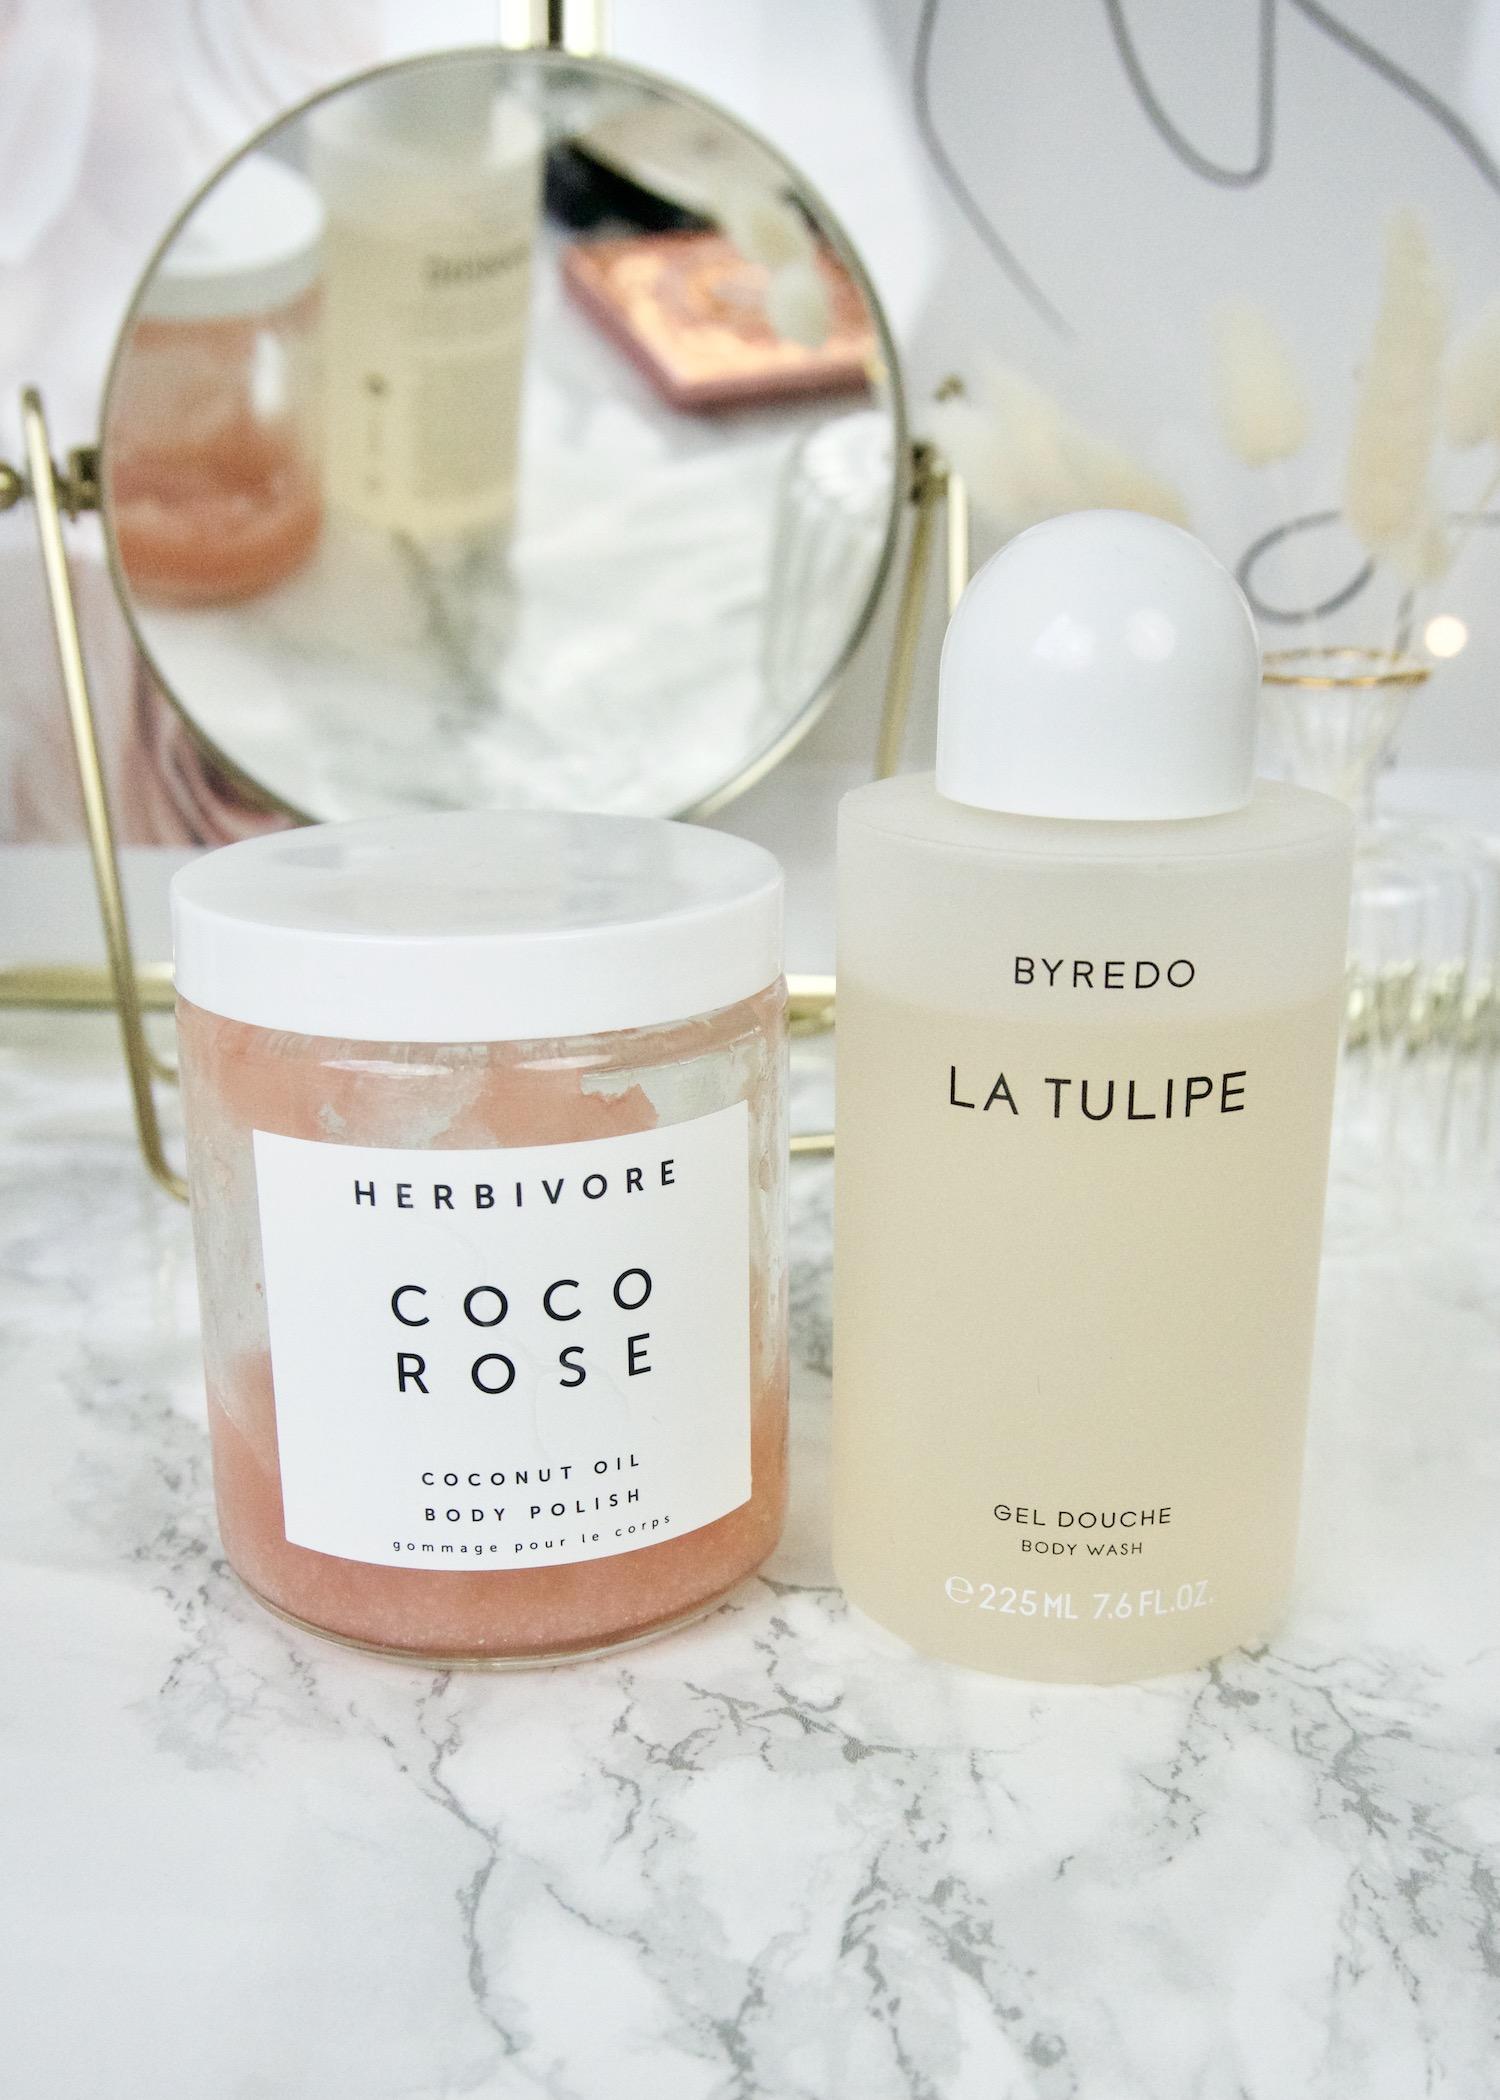 beauty favorieten lente Herbivore Botanicals Coco Rose body polish, Byredo La Tulipe gel douche